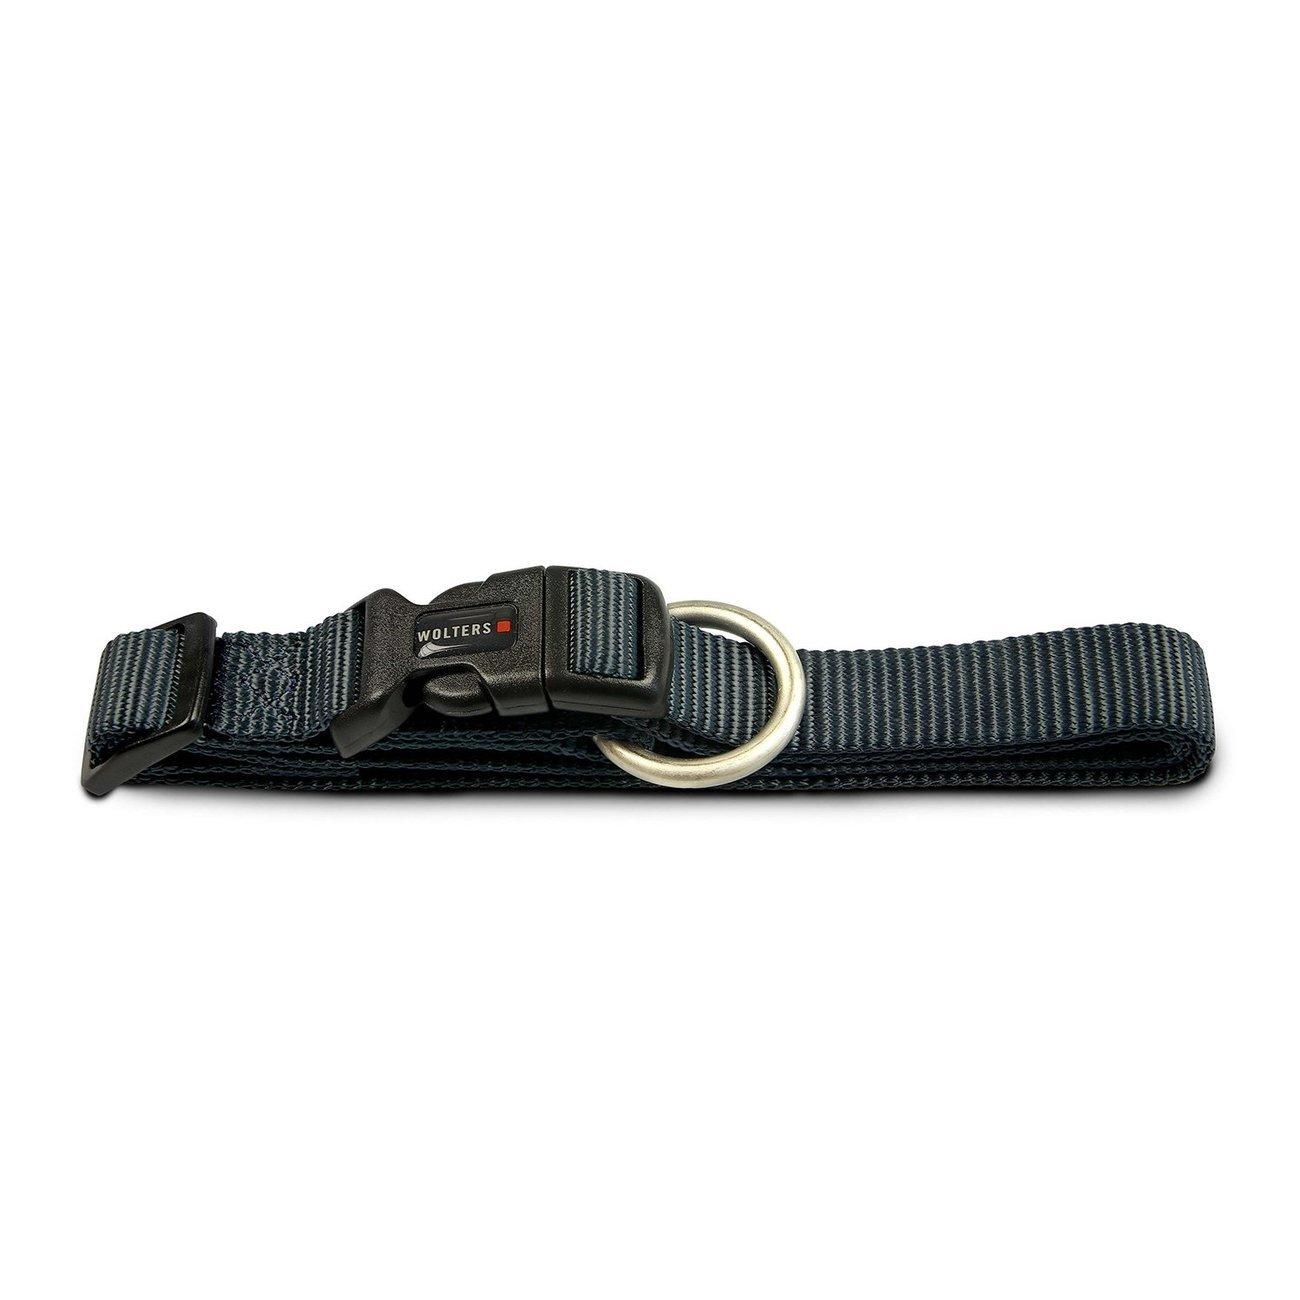 Wolters Halsband Nylon Professional, Bild 8